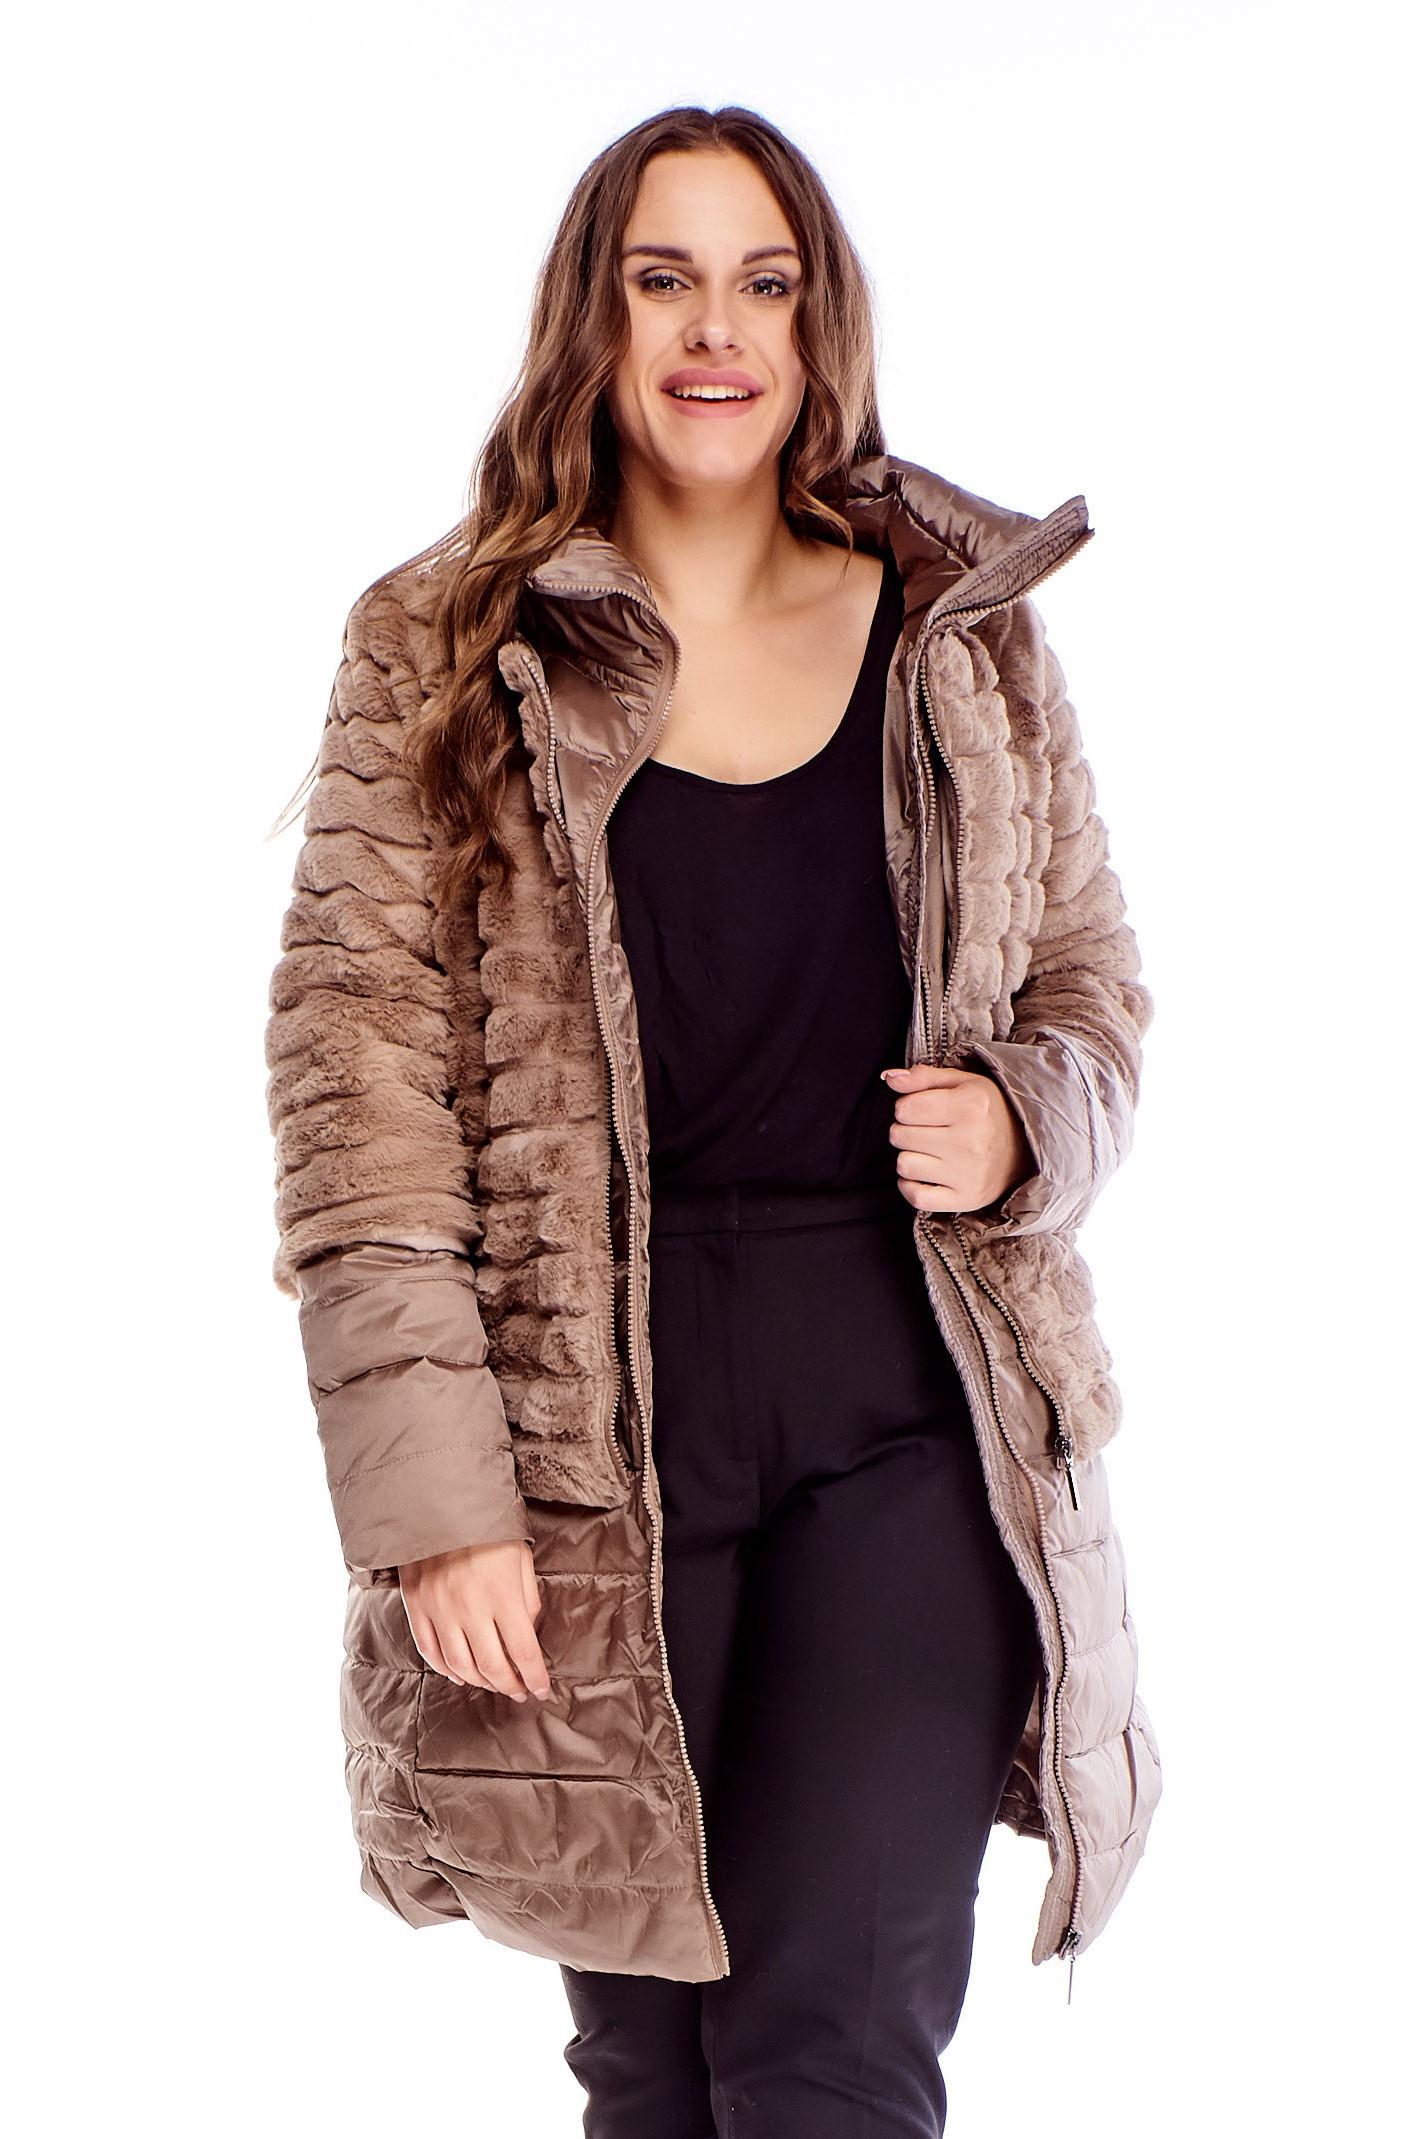 Dámska dlhá hnedá zimná bunda s kožušinou - 46